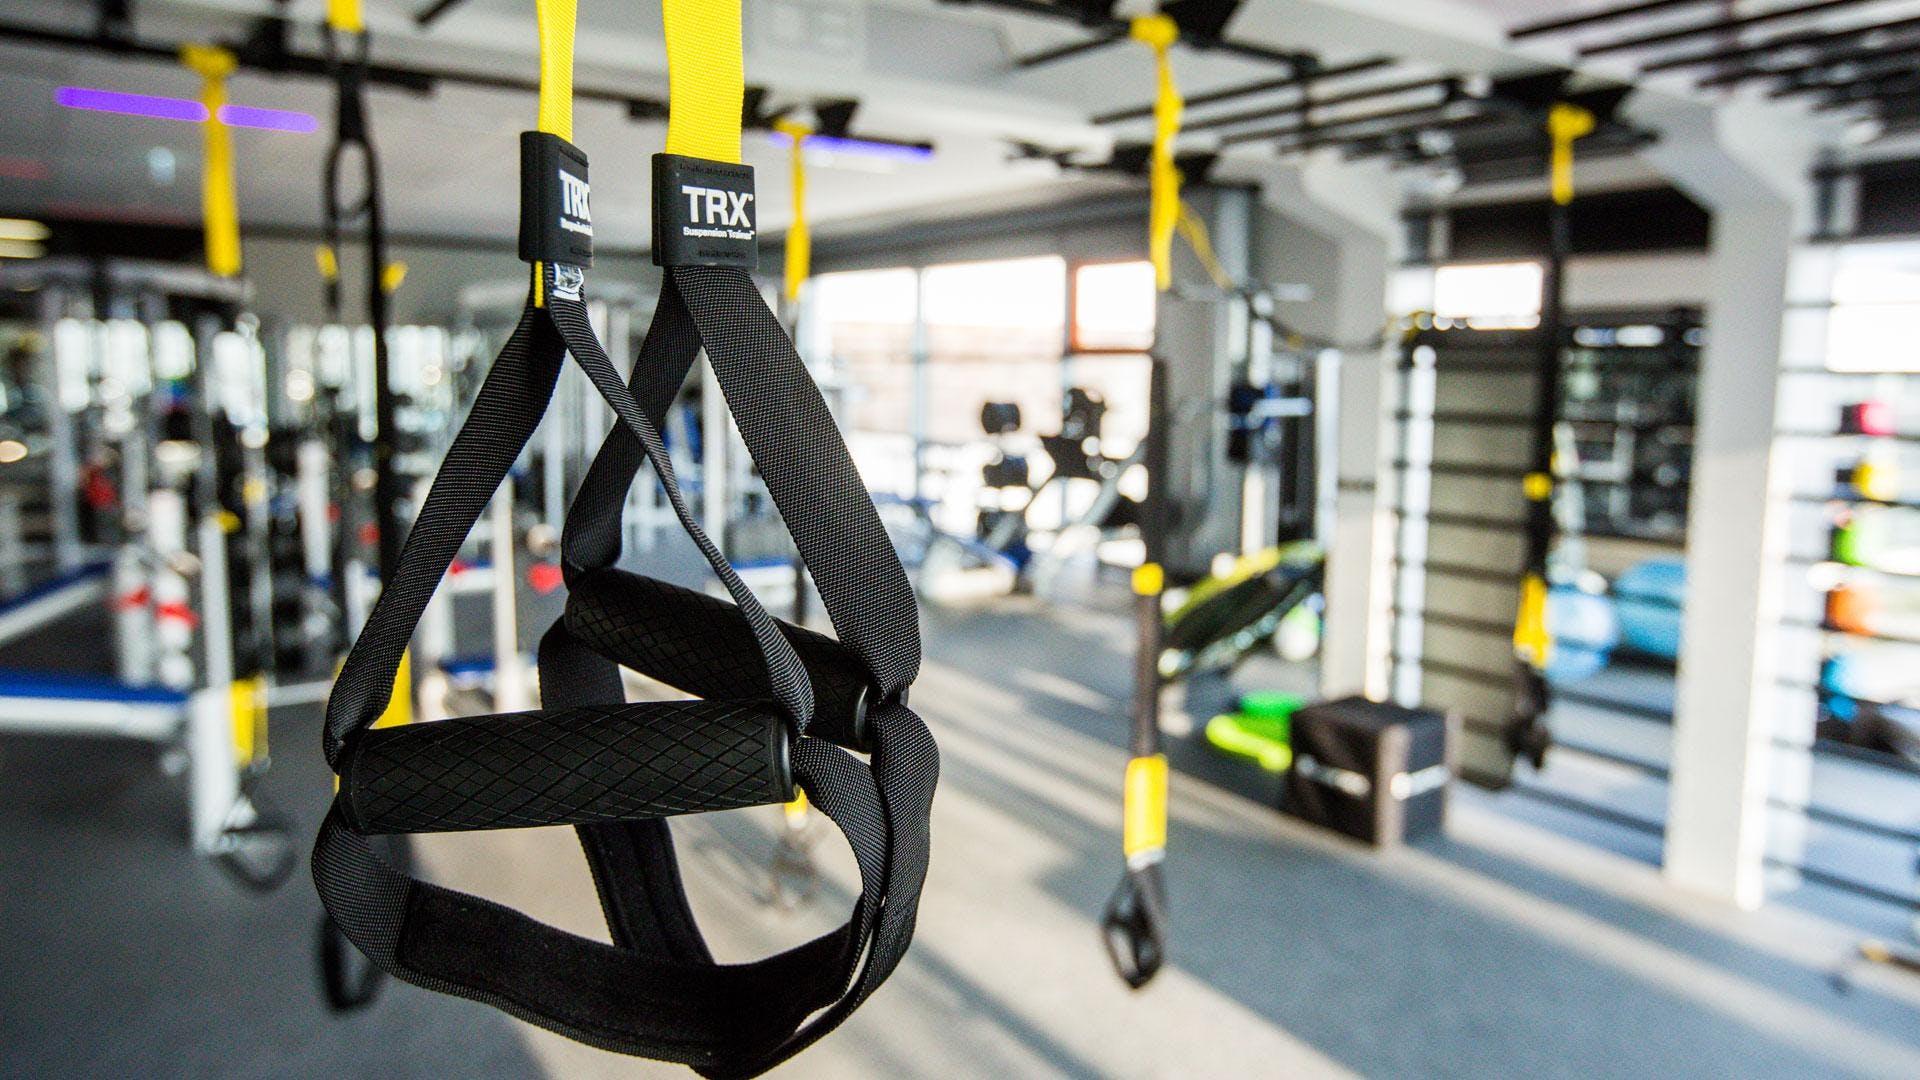 April • TRX® Strength Workout @ Under Armour